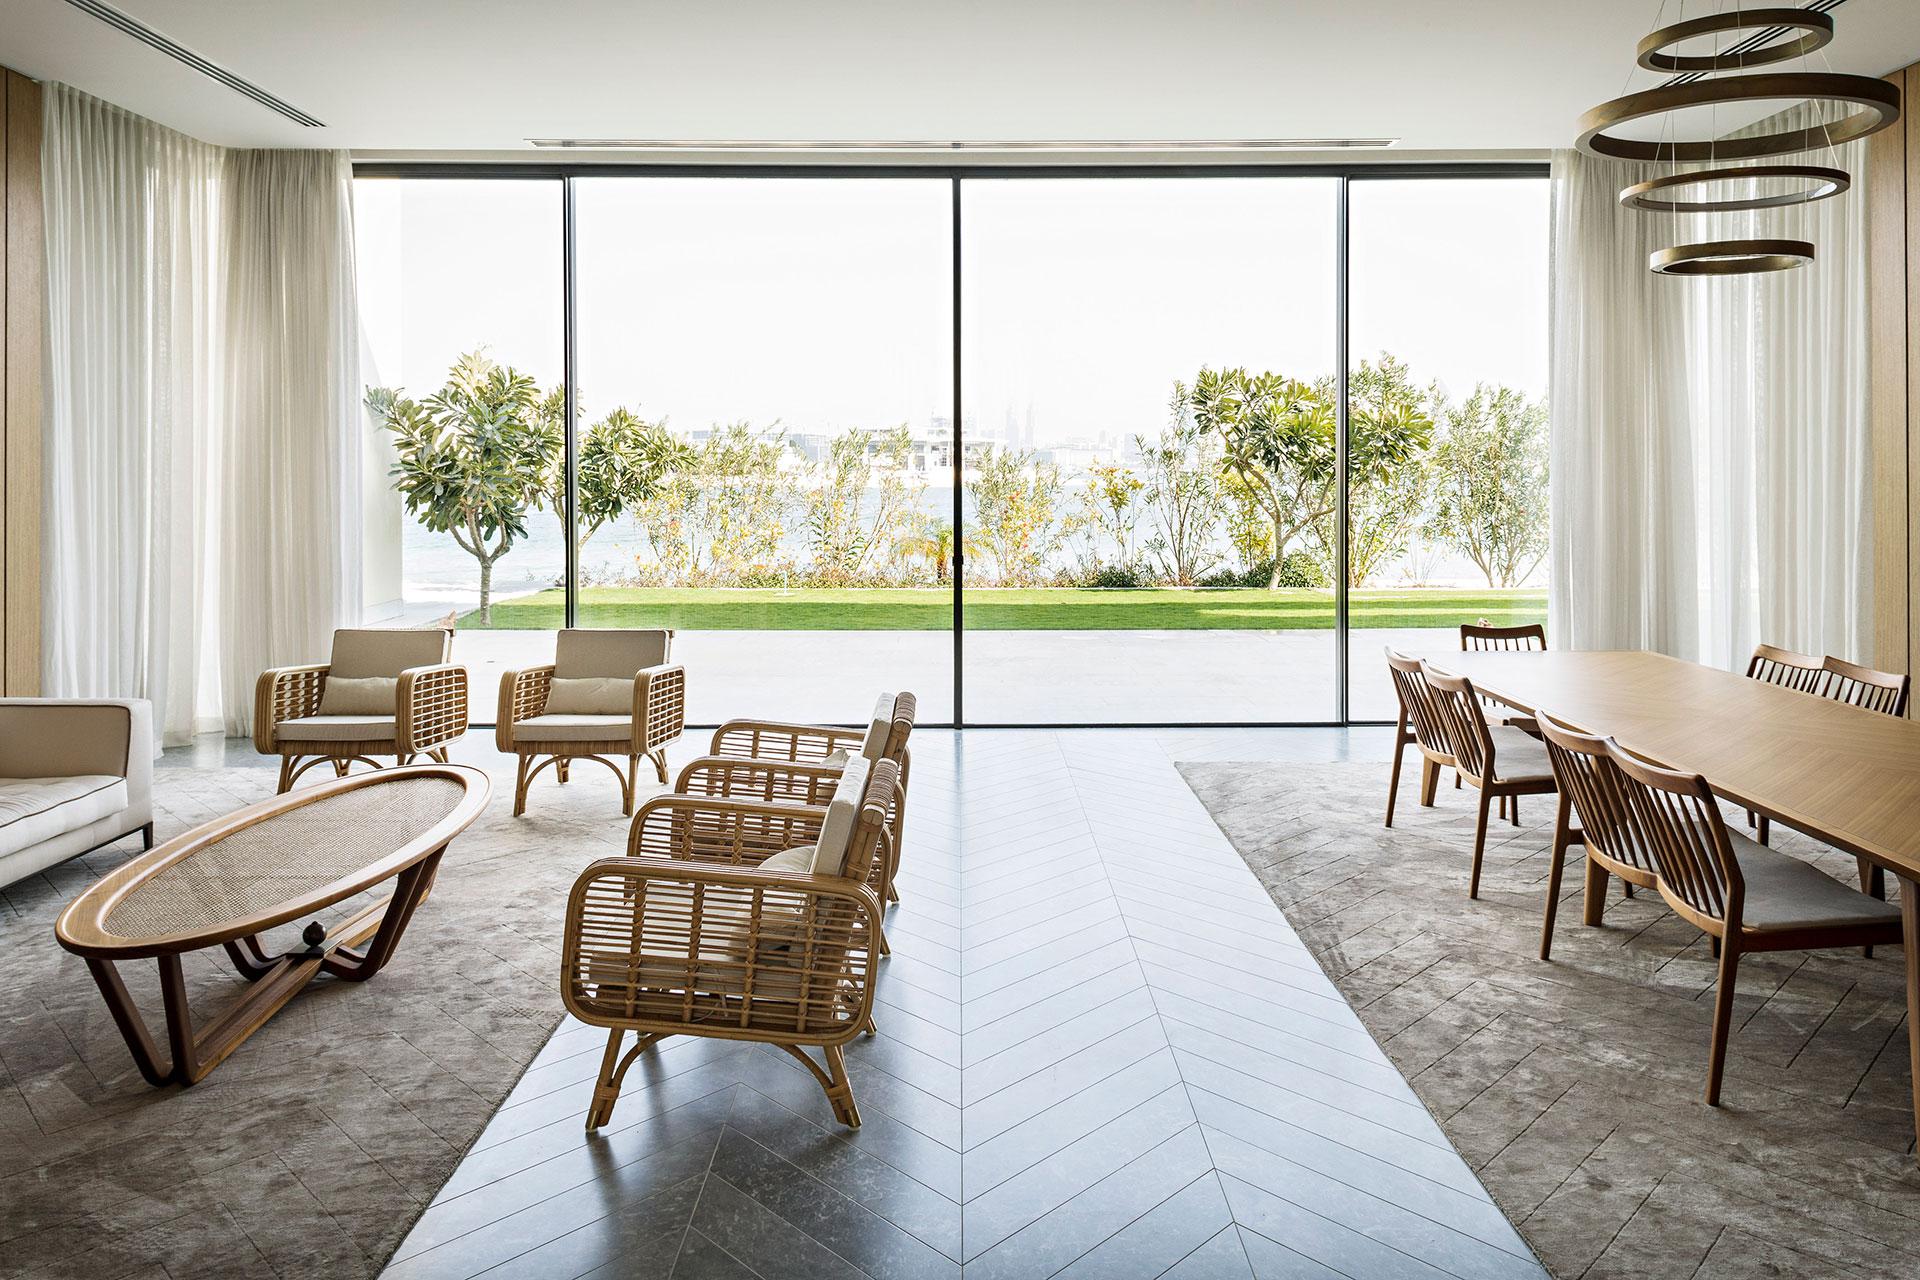 DUB5-AMAR-SABEH-Architecture-Studio-Palm-villa-Dubai-2018-©Yann-Deret-8195.jpg